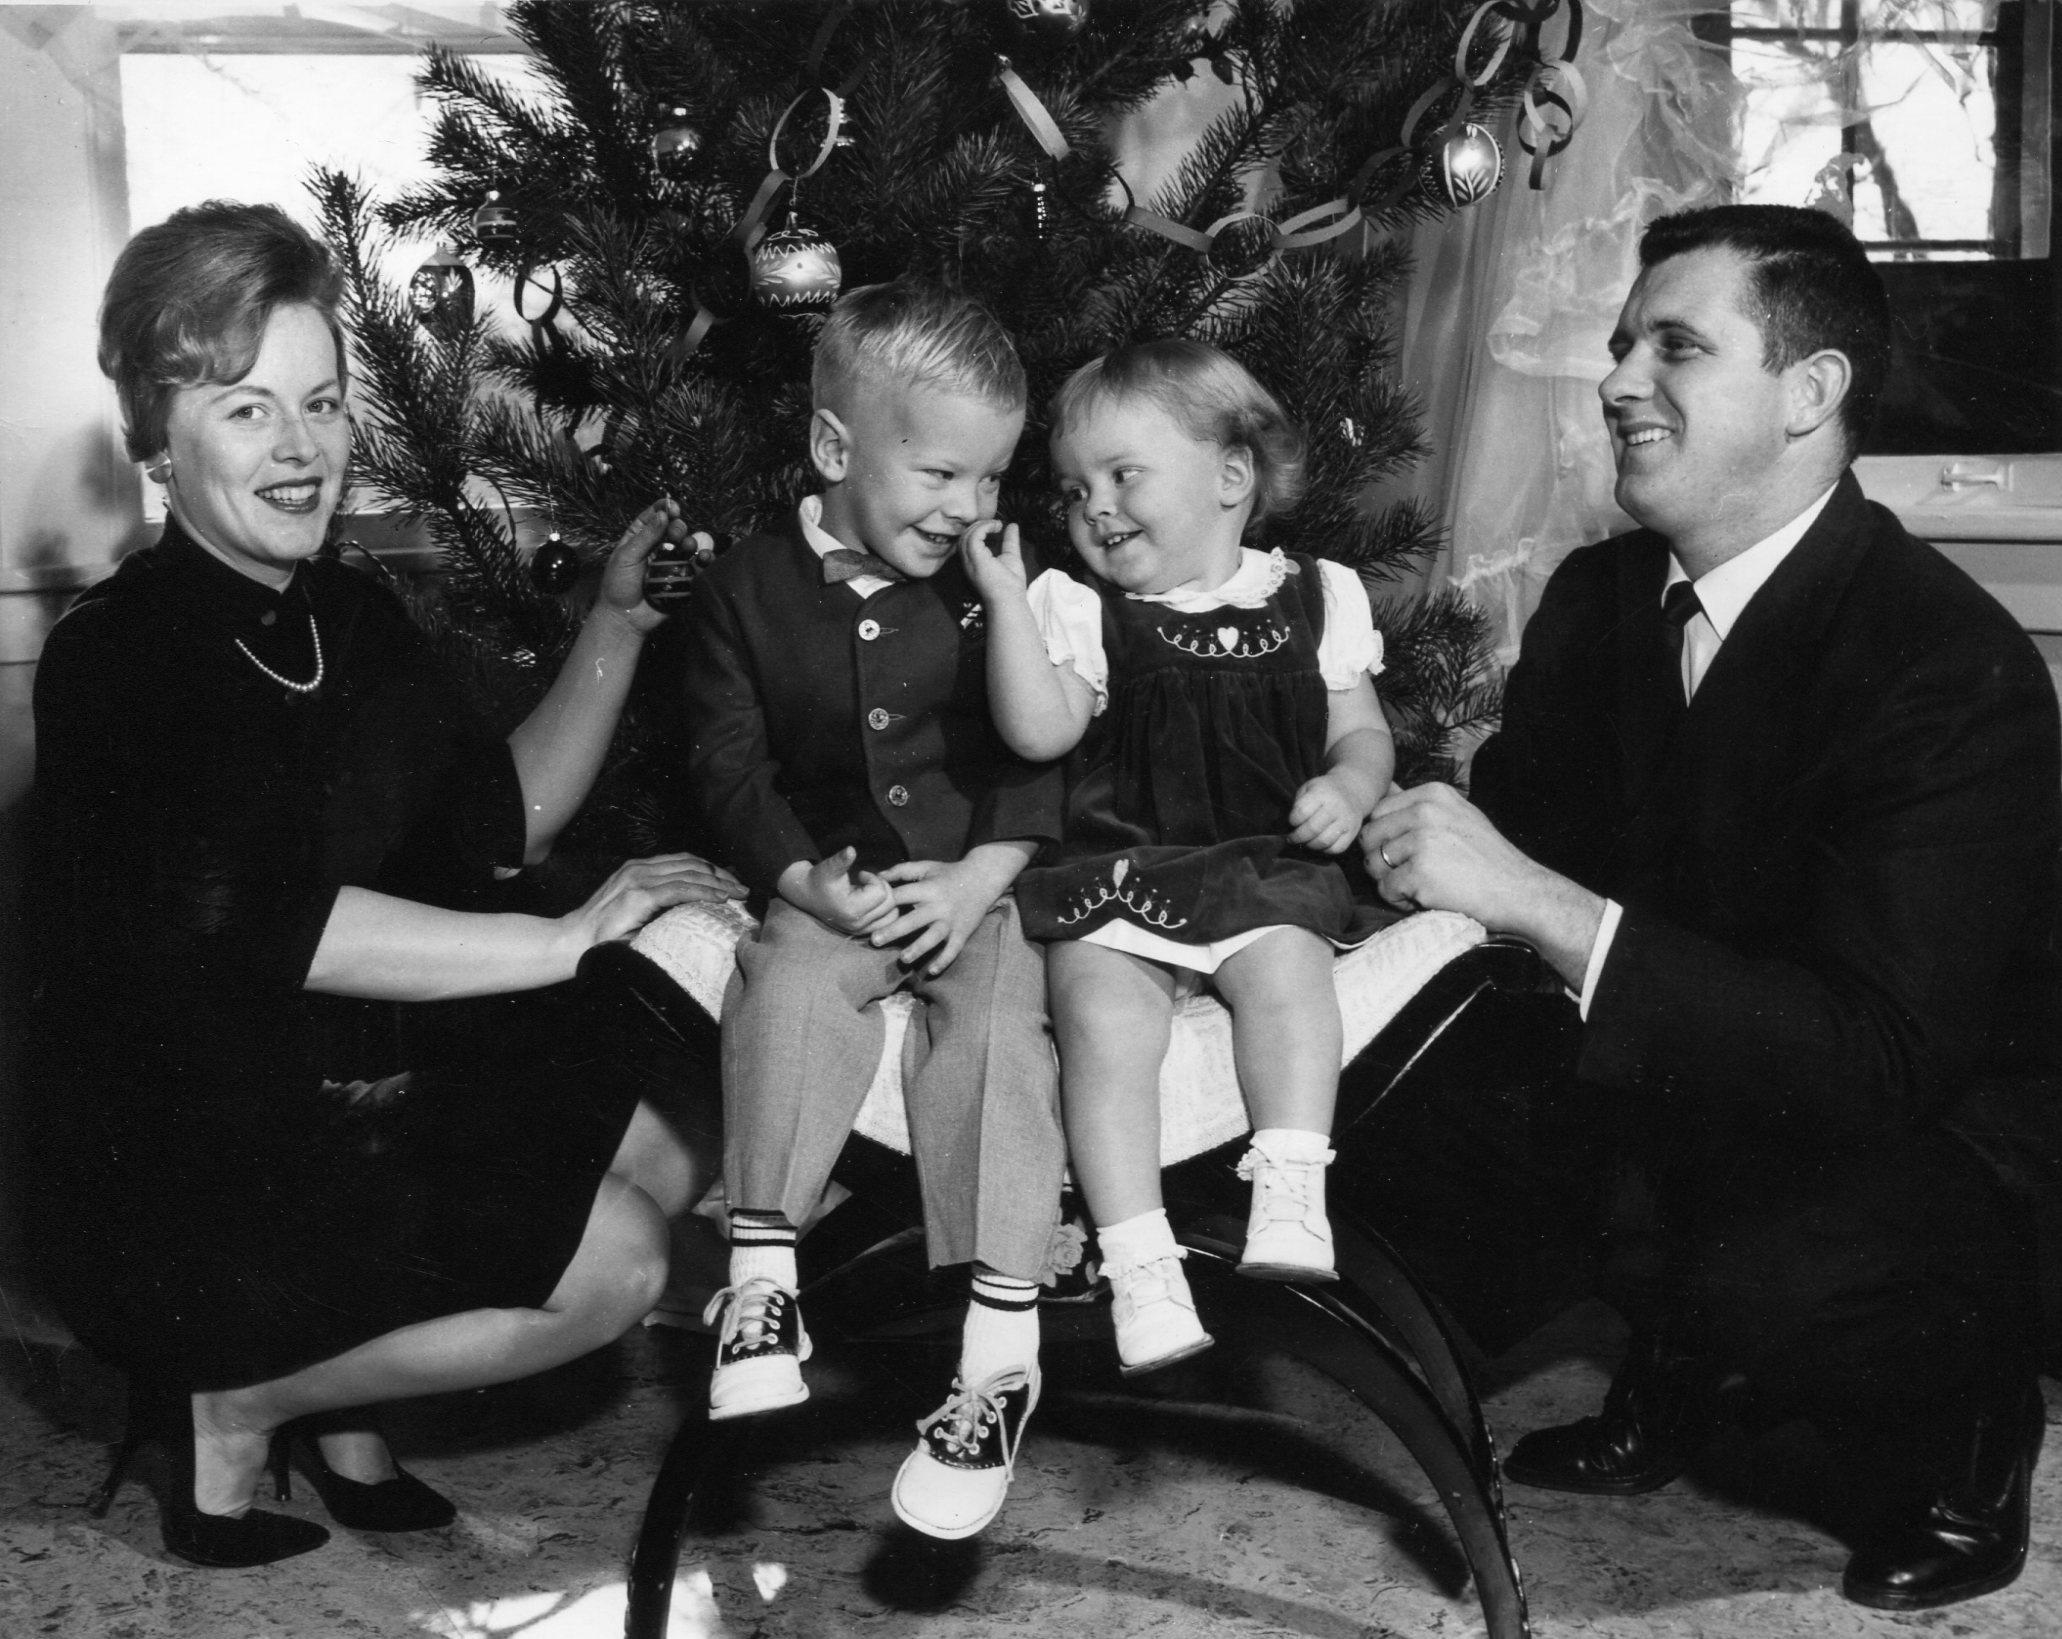 person black and white people photography retro child black monochrome christmas season family photograph image december - Black People Christmas